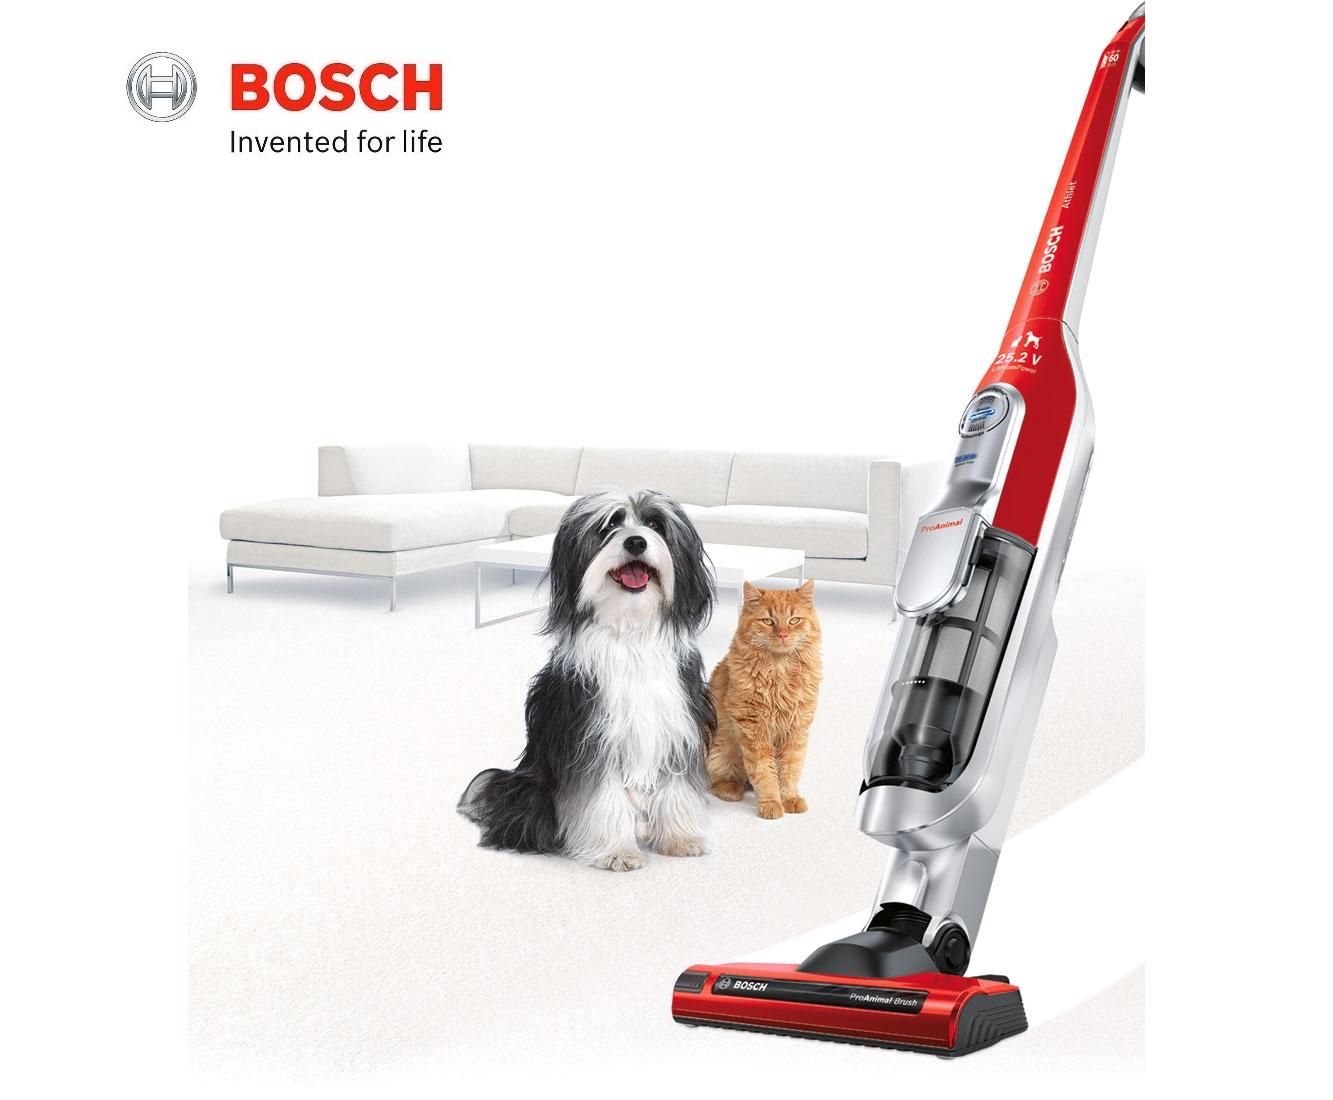 Bosch Athlet Animal Pro Cordless Upright Vacuum Cleaner